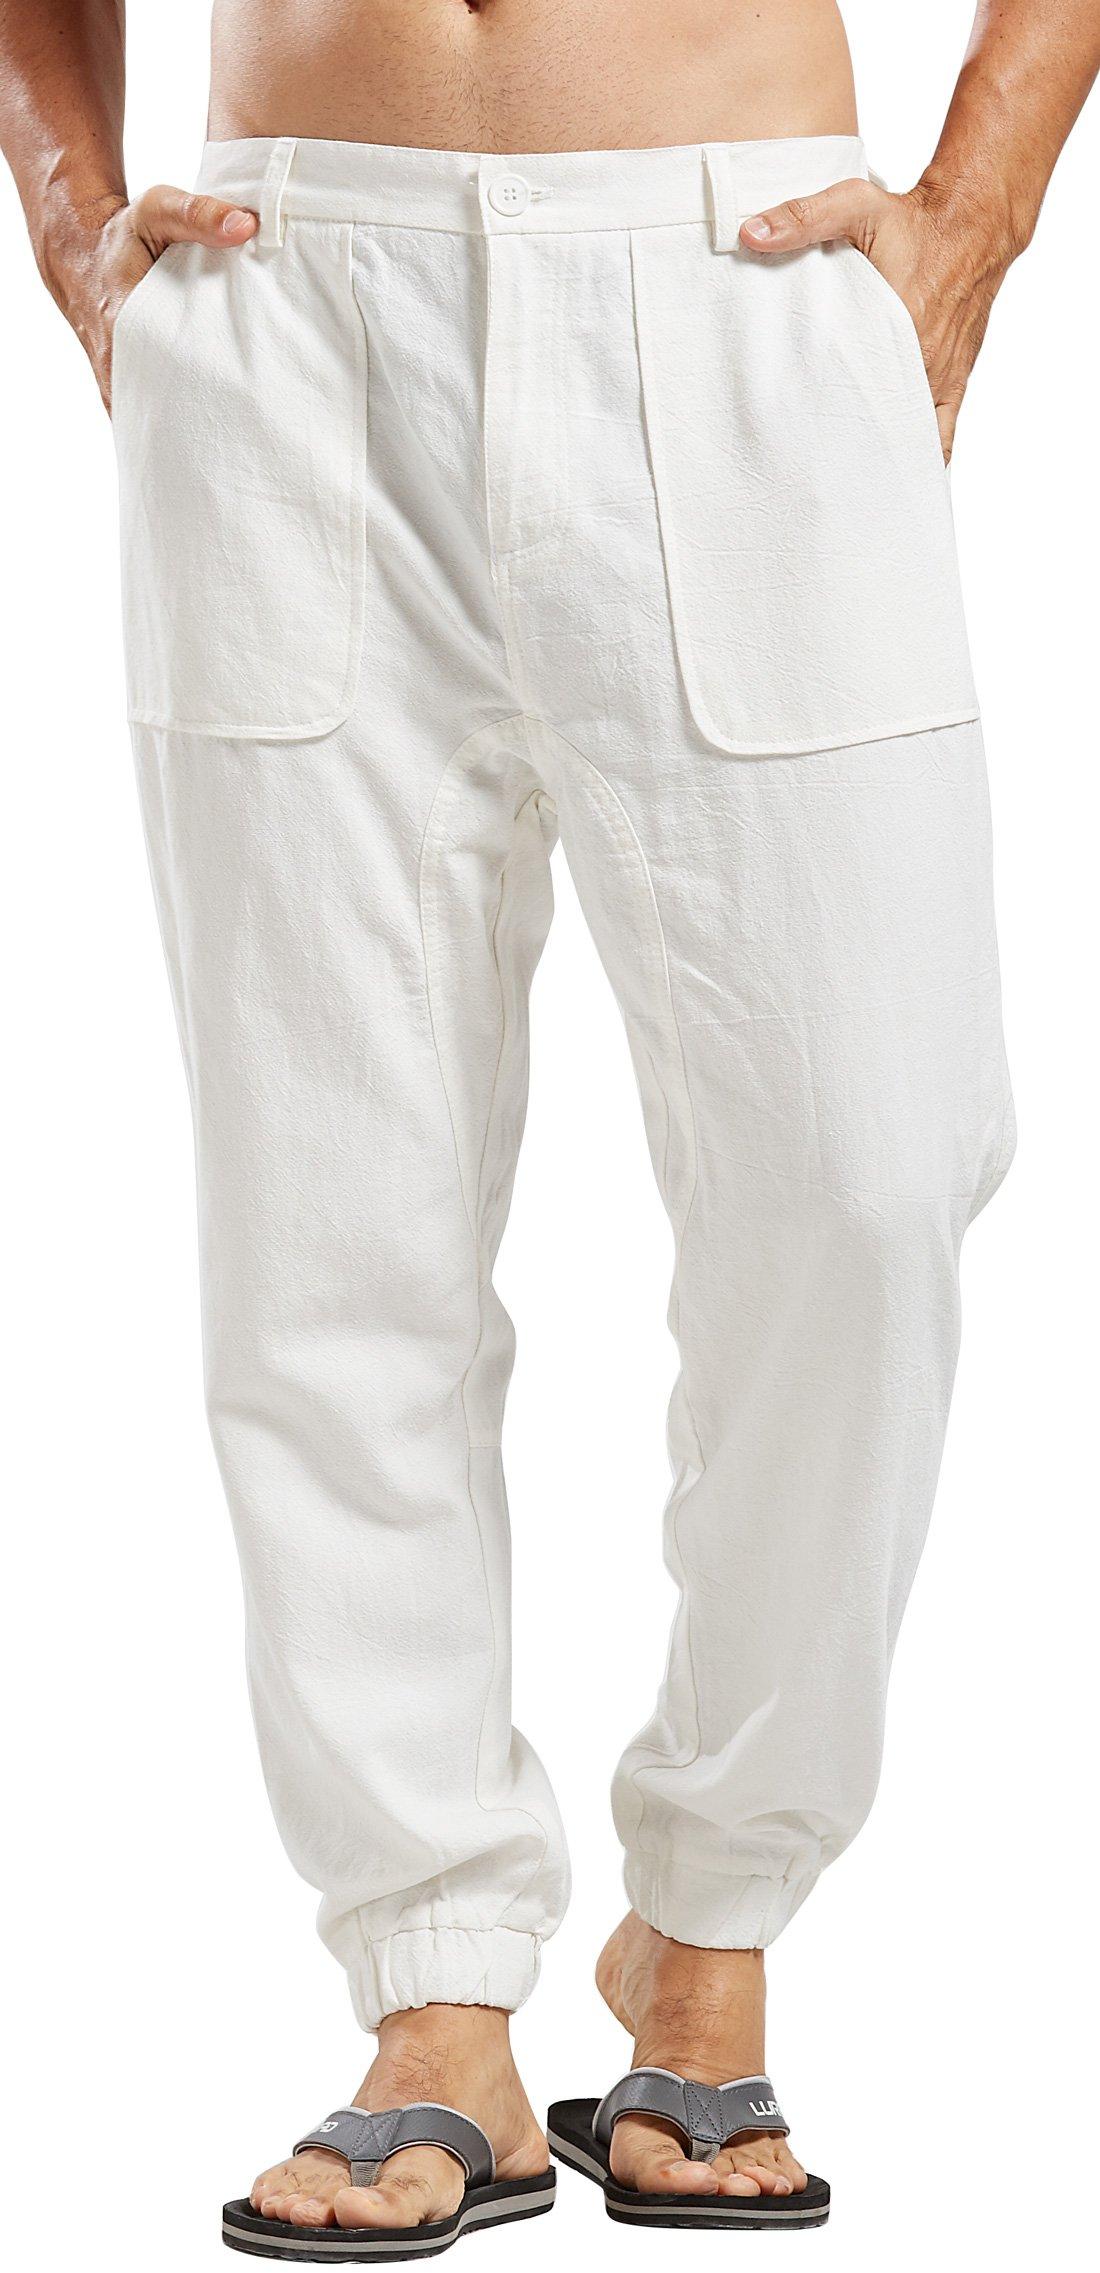 utcoco Men's Casual Side-Elastic Waist Tapered Flat-Front Linen Jogger Pants (Medium, White)